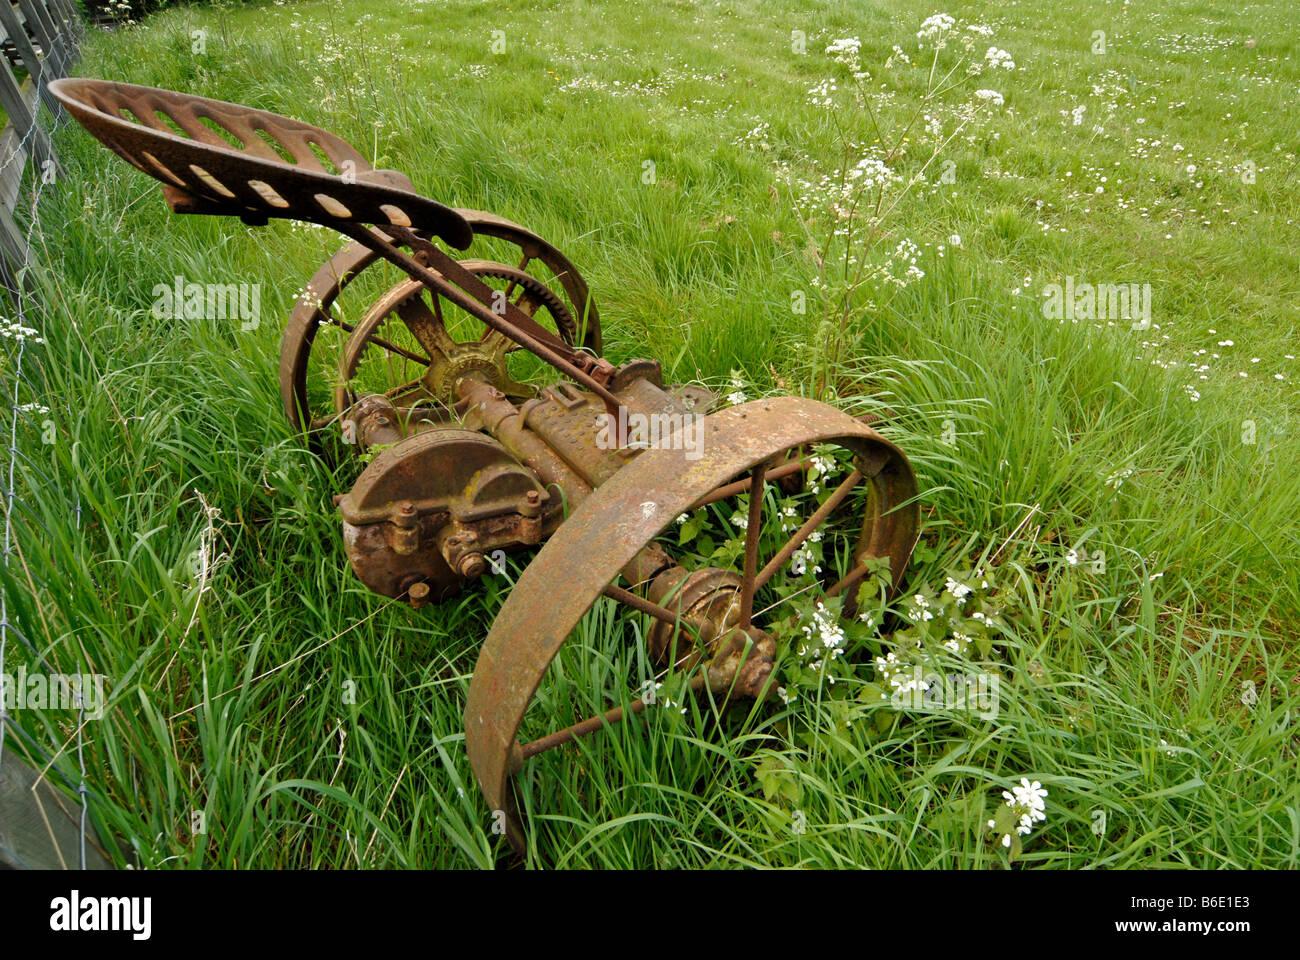 ALTE FARM MASCHINE Stockfoto